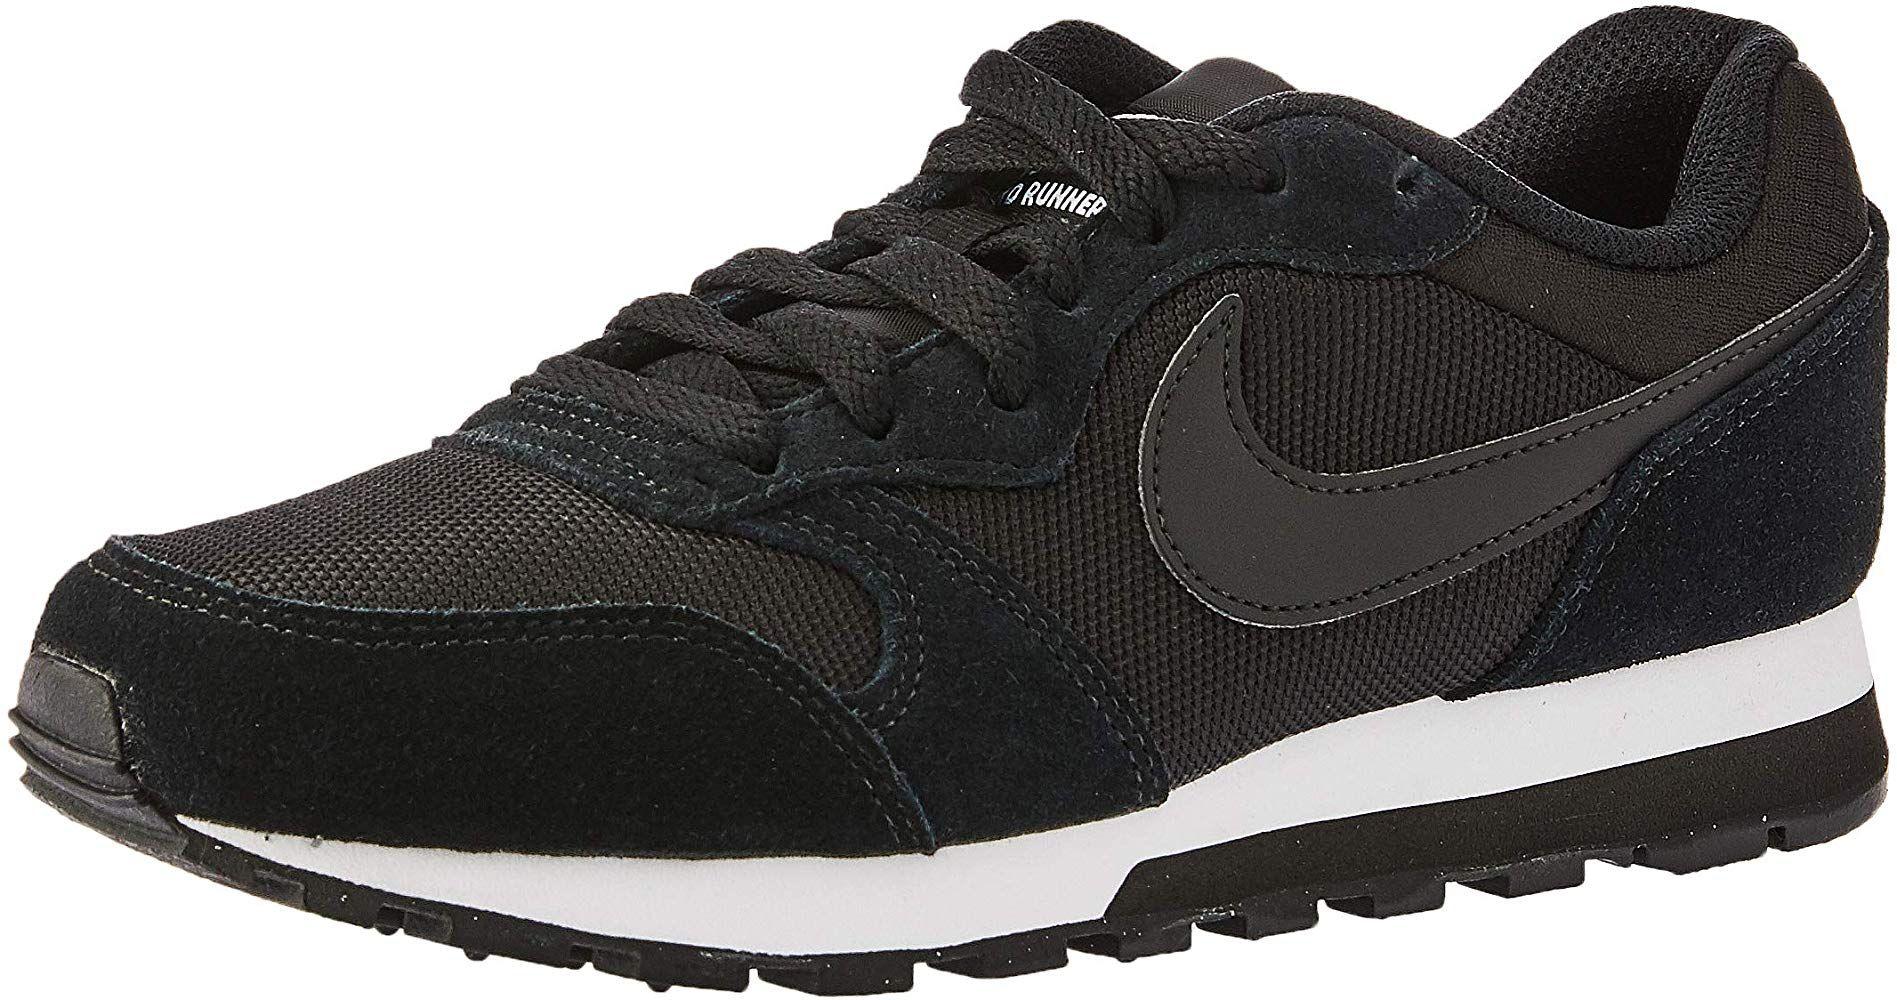 Baskets de running Nike MD Runner 2 - Différentes tailles